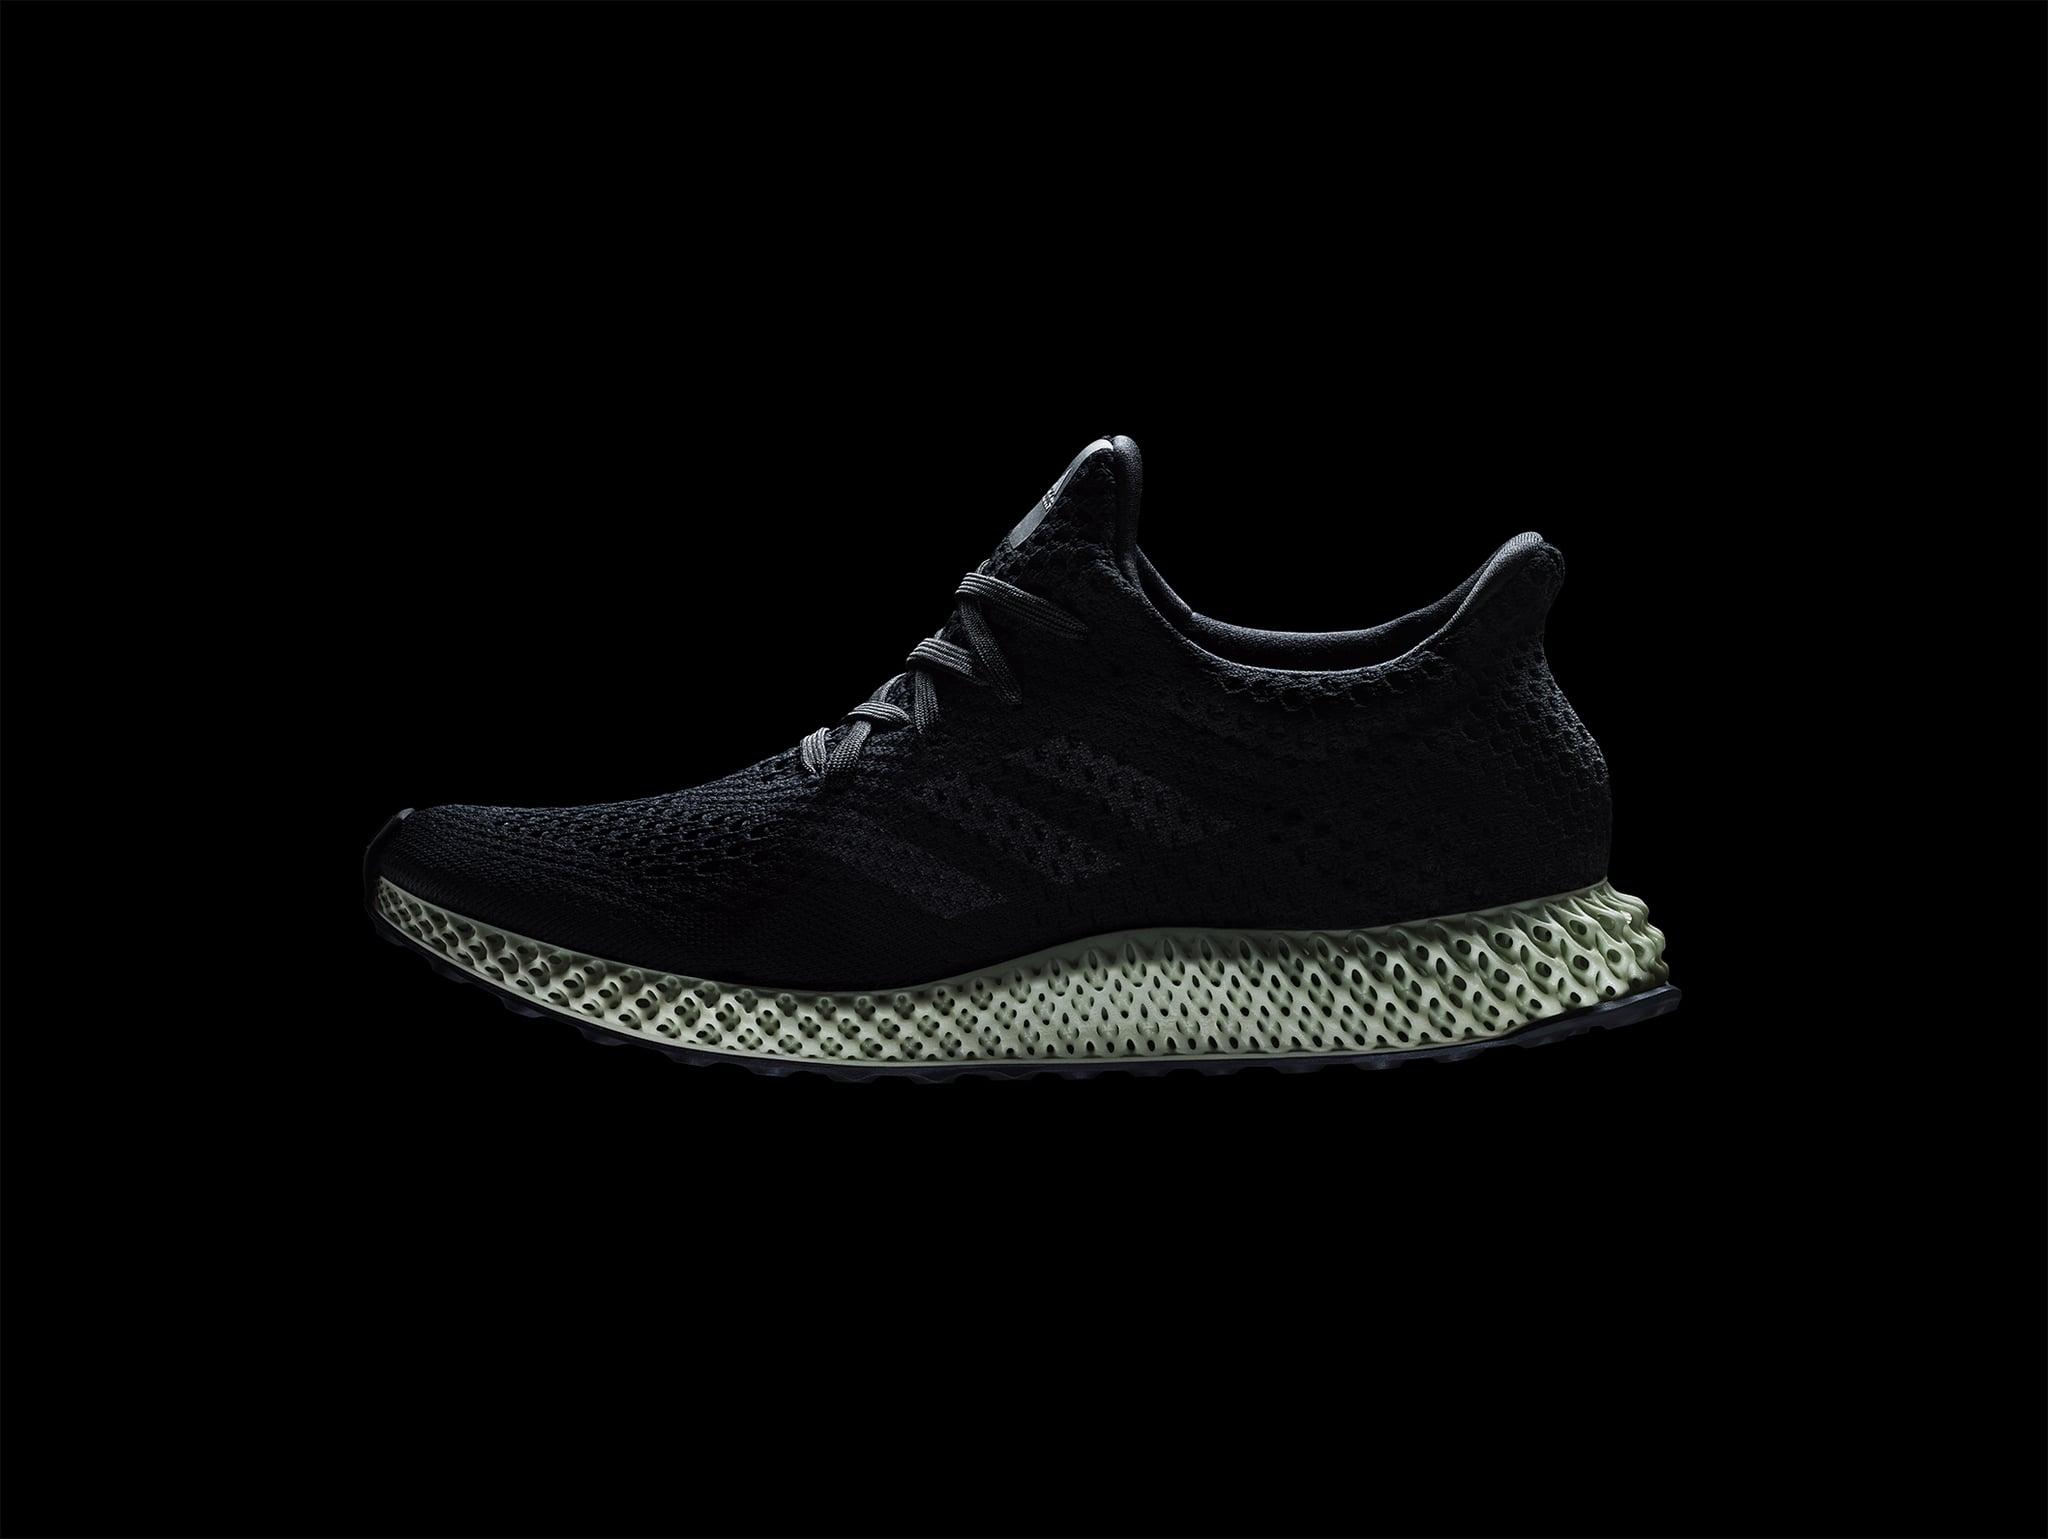 f3115564e Adidas Futurecraft 4D Sneaker